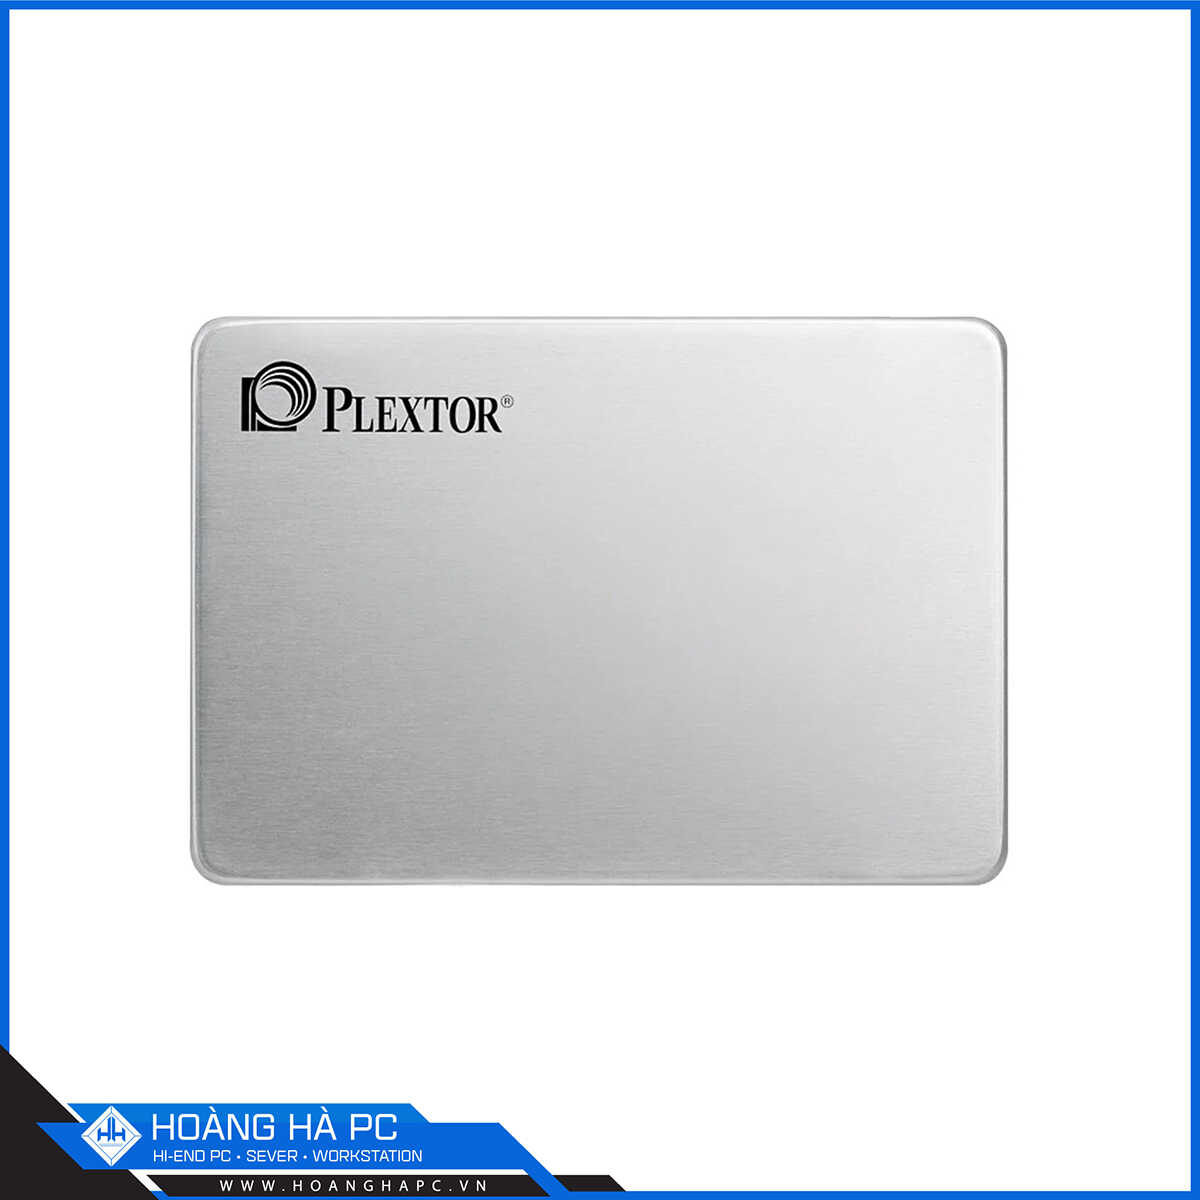 SSD Plextor PX-256M8VC 256GB